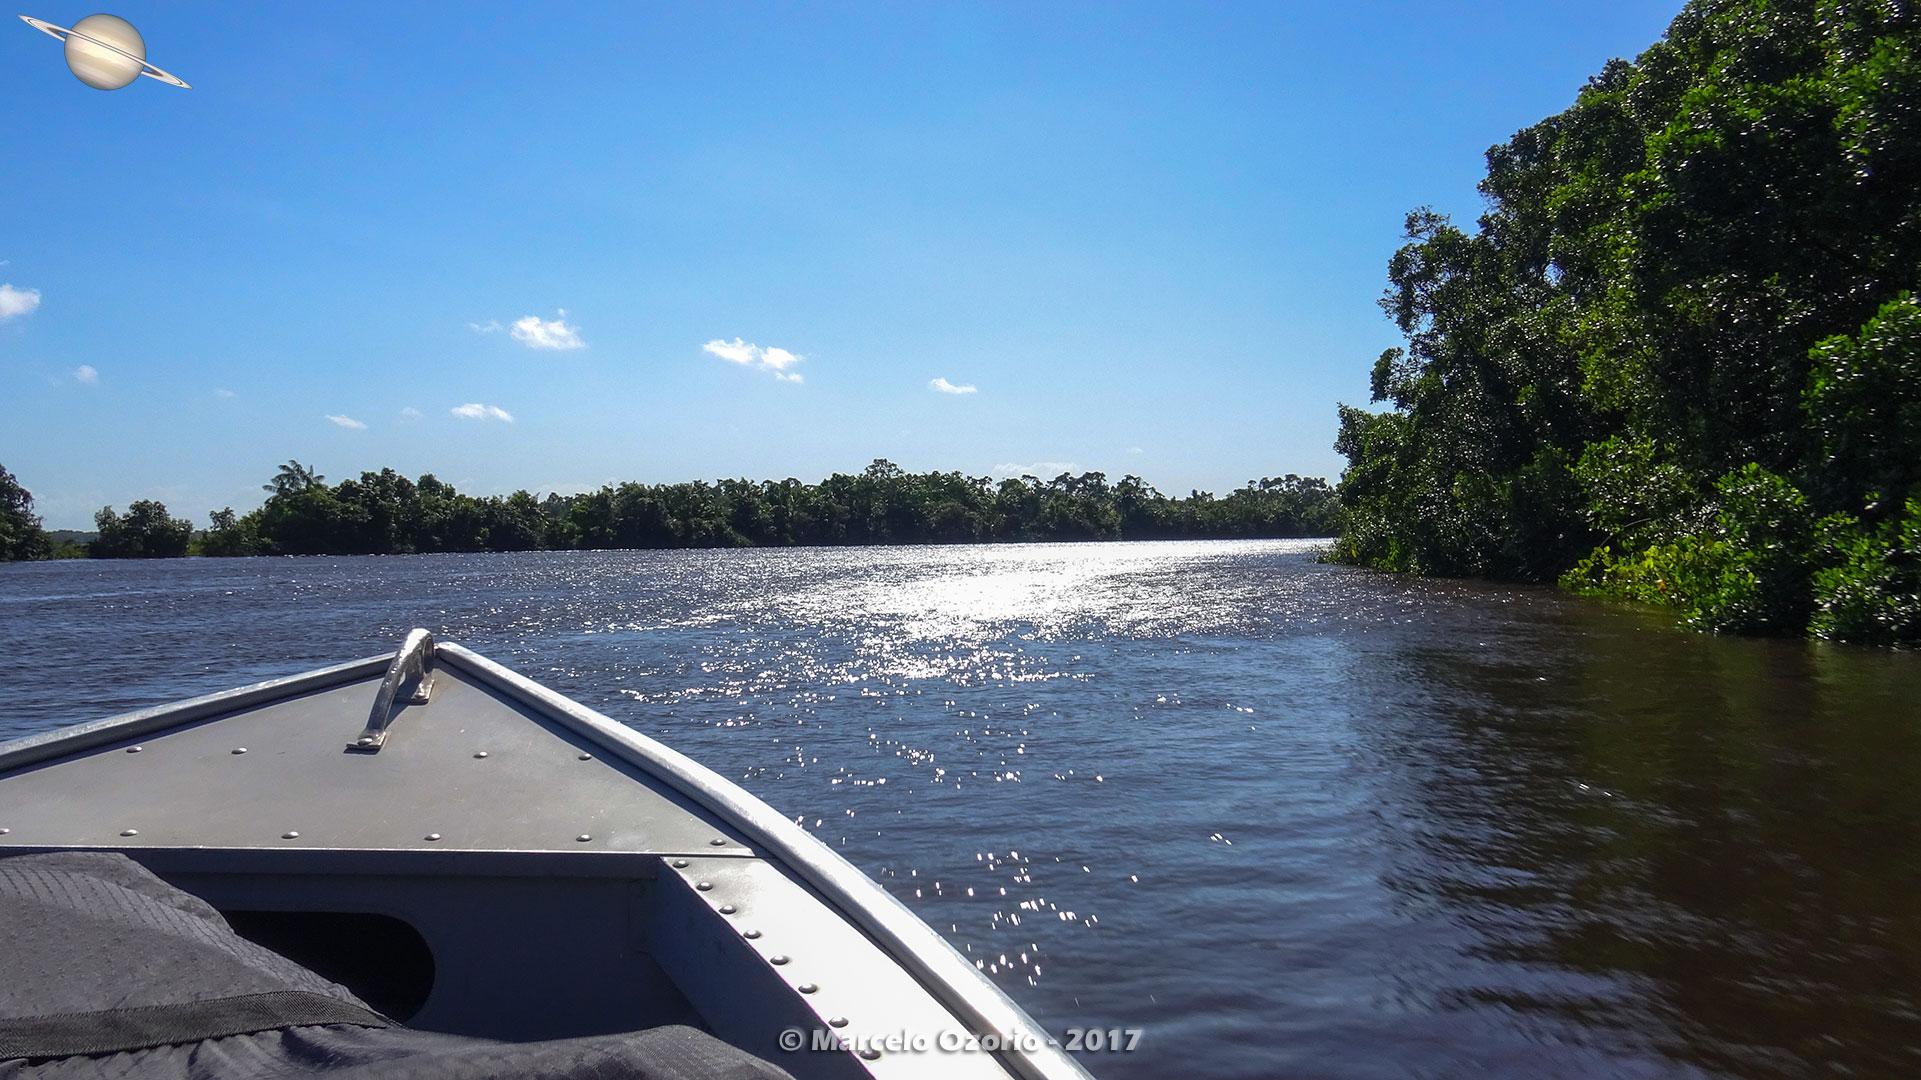 Descendo de Lancha no Rio Preguiças